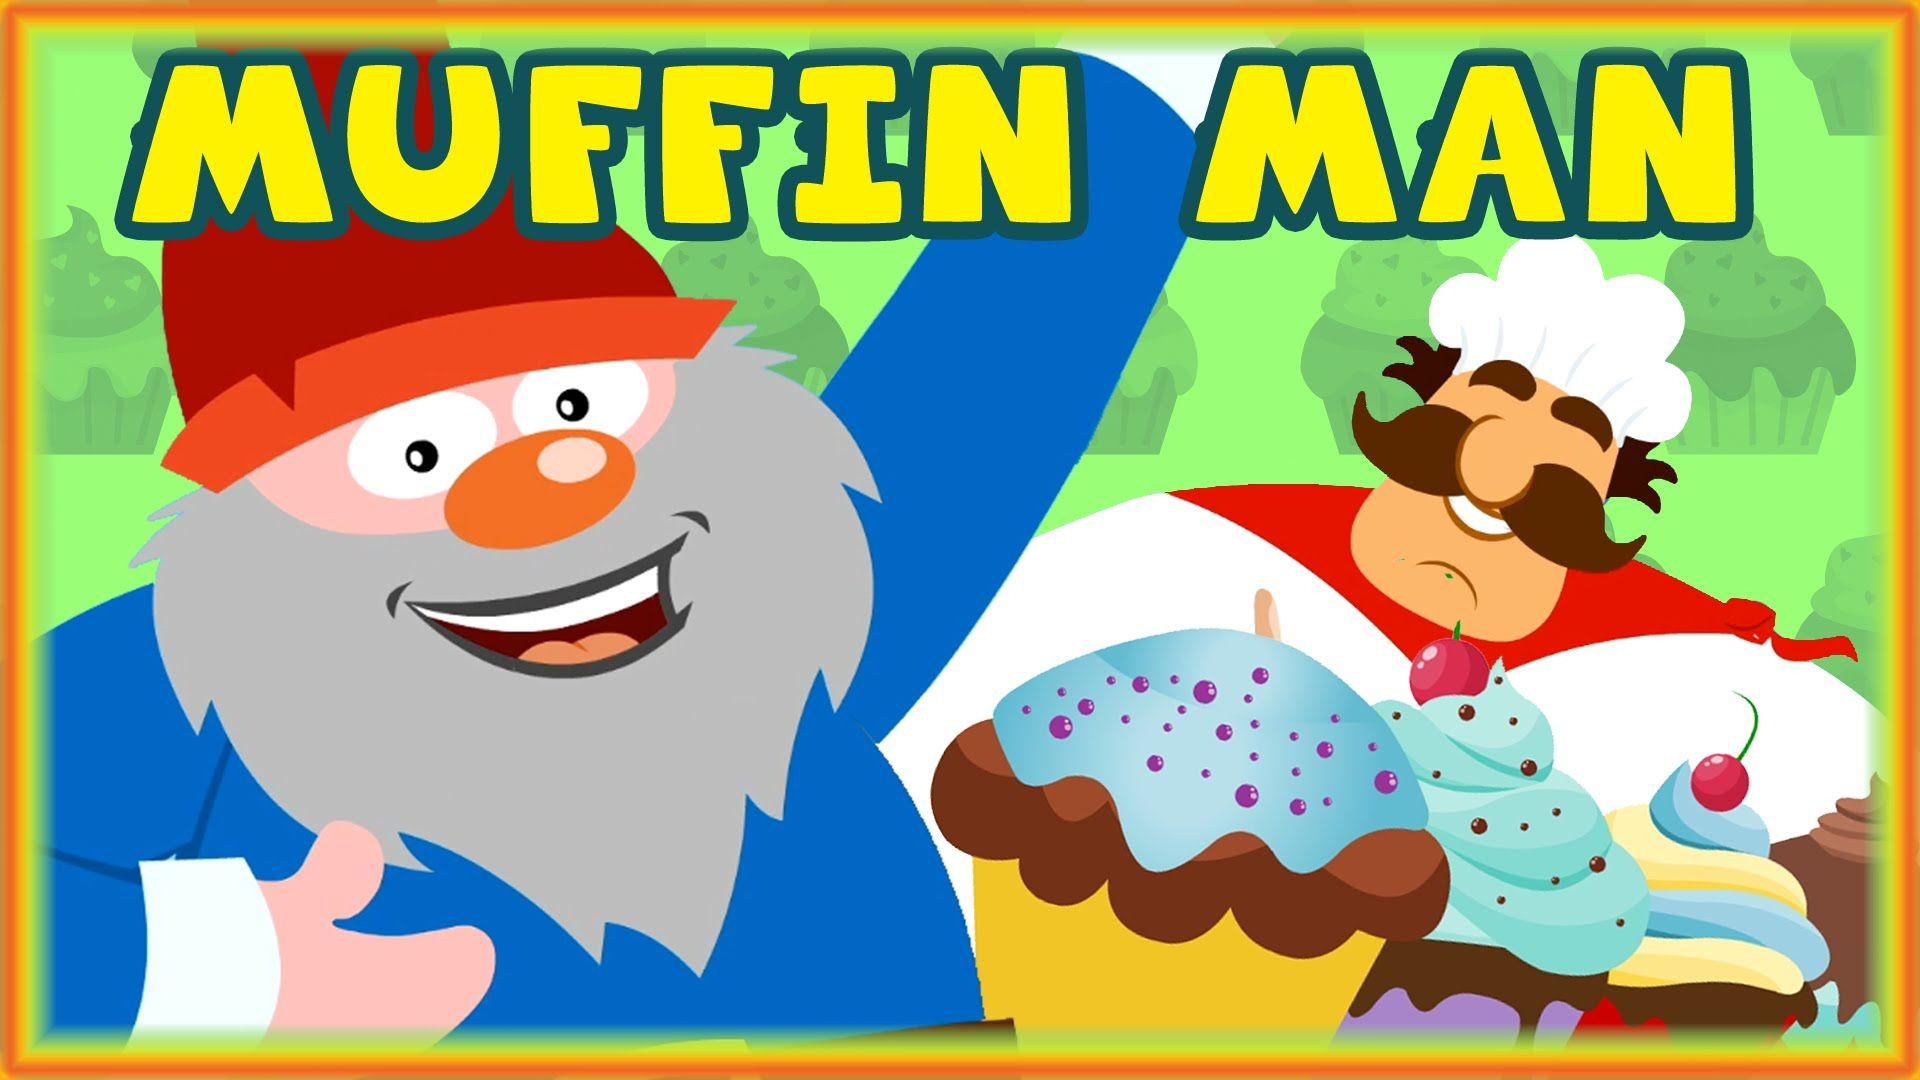 Pin By Kadir Hemrol On Do You Know The Muffin Man